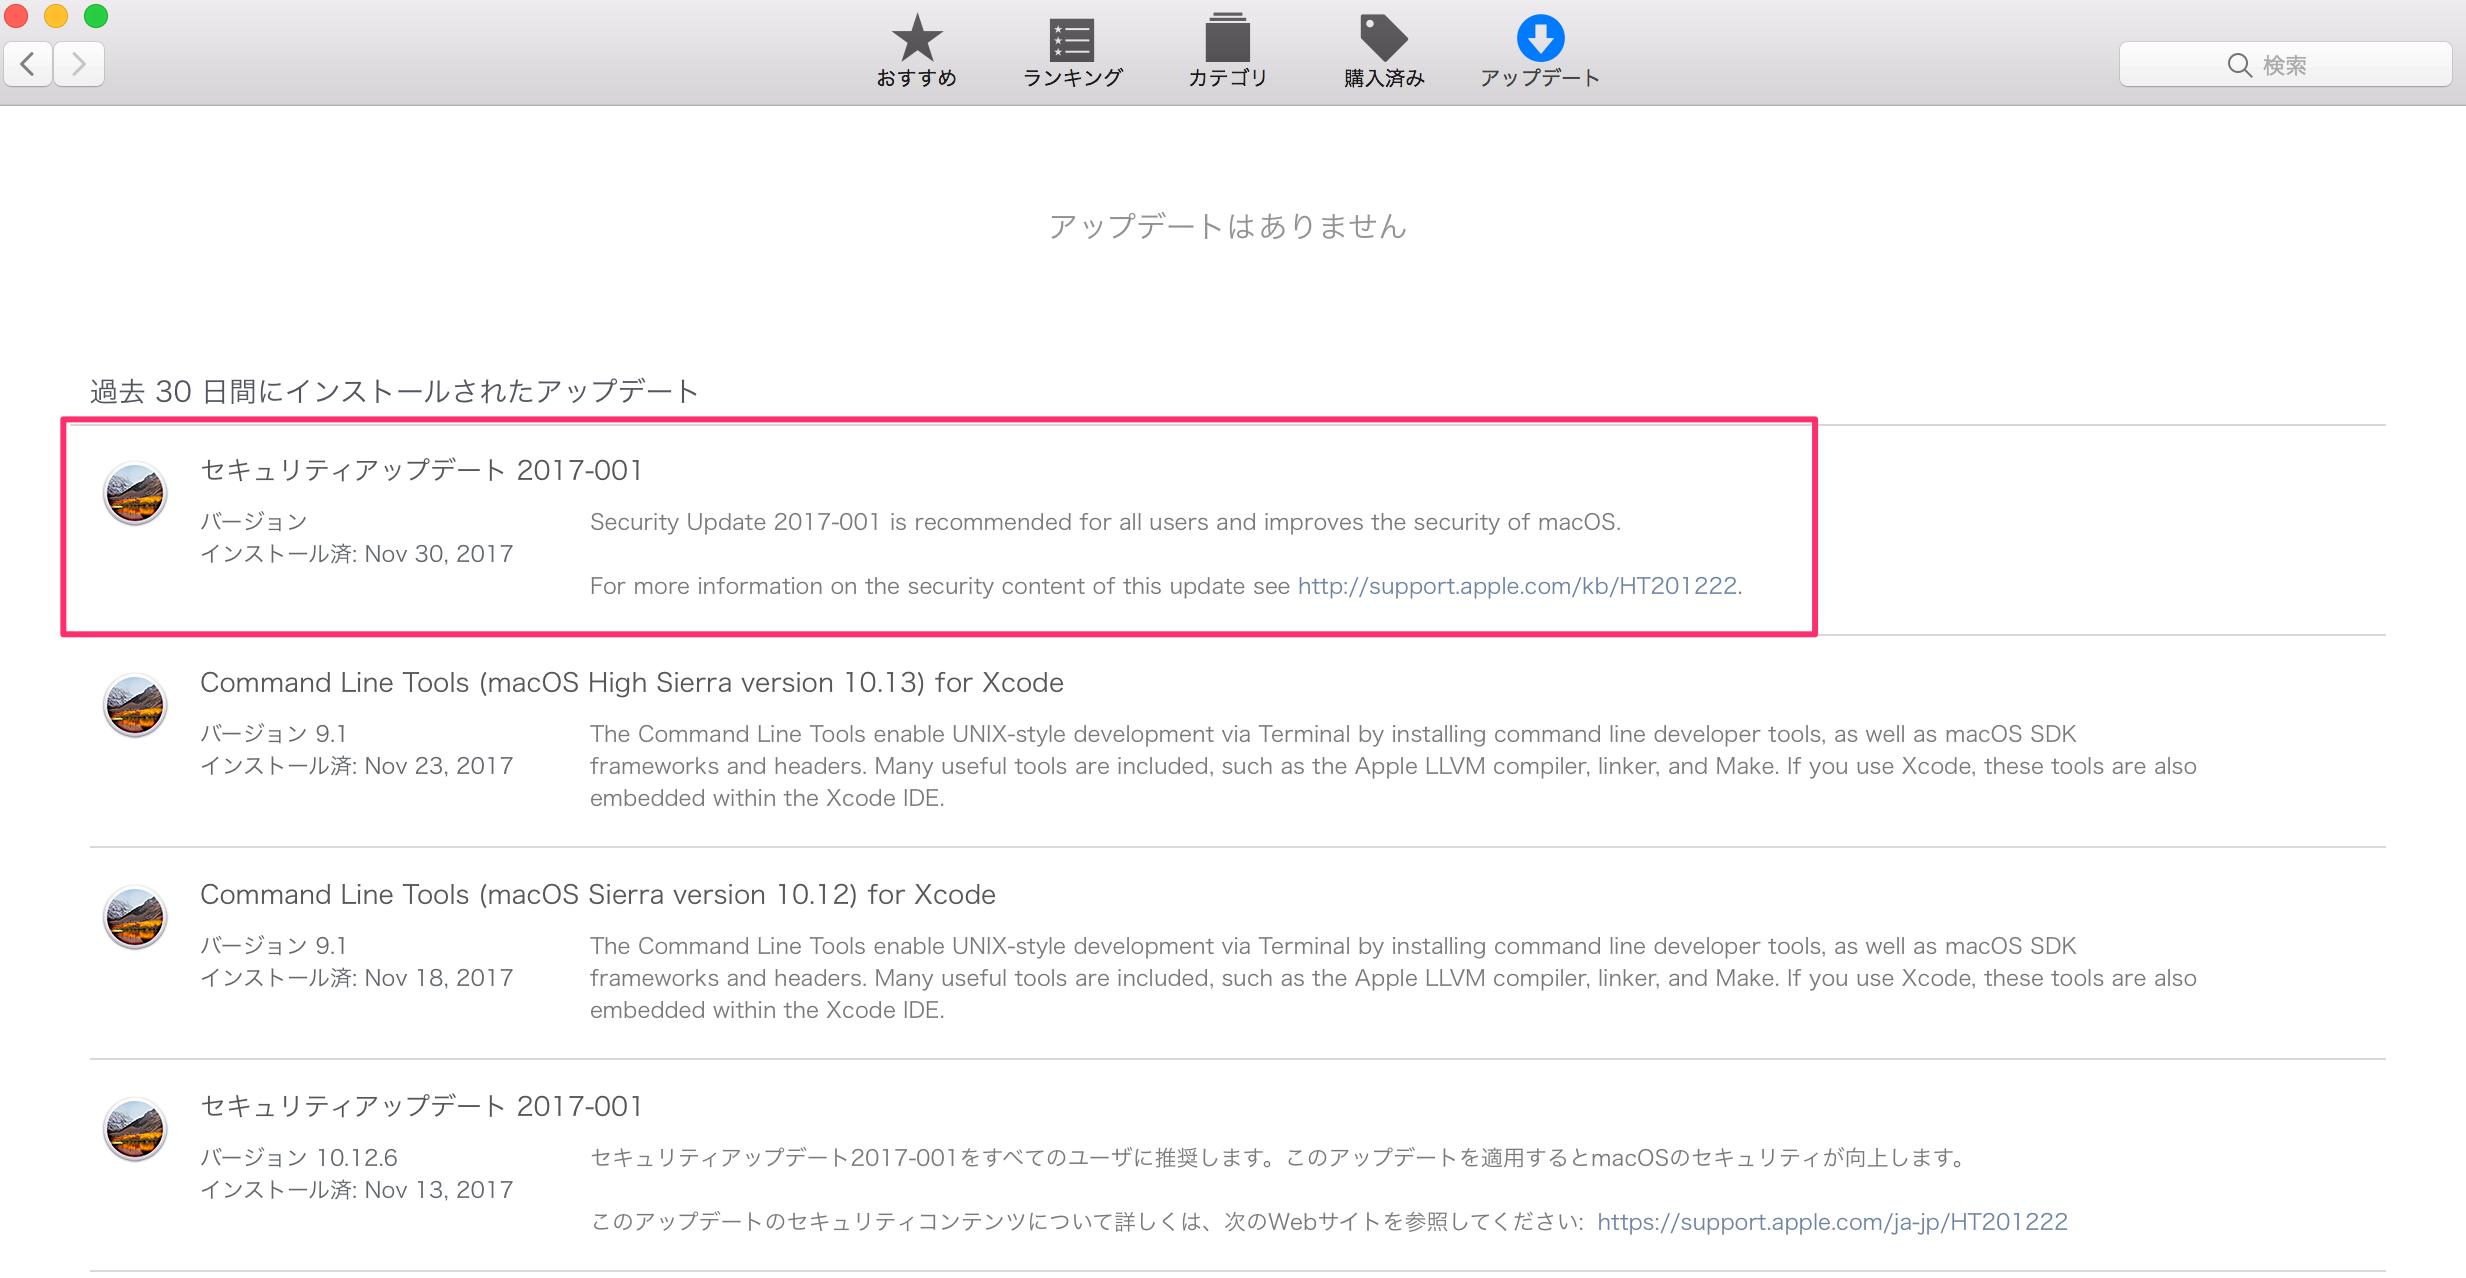 macOS High Sierra 10 13 1 セキュリティアップデートについて